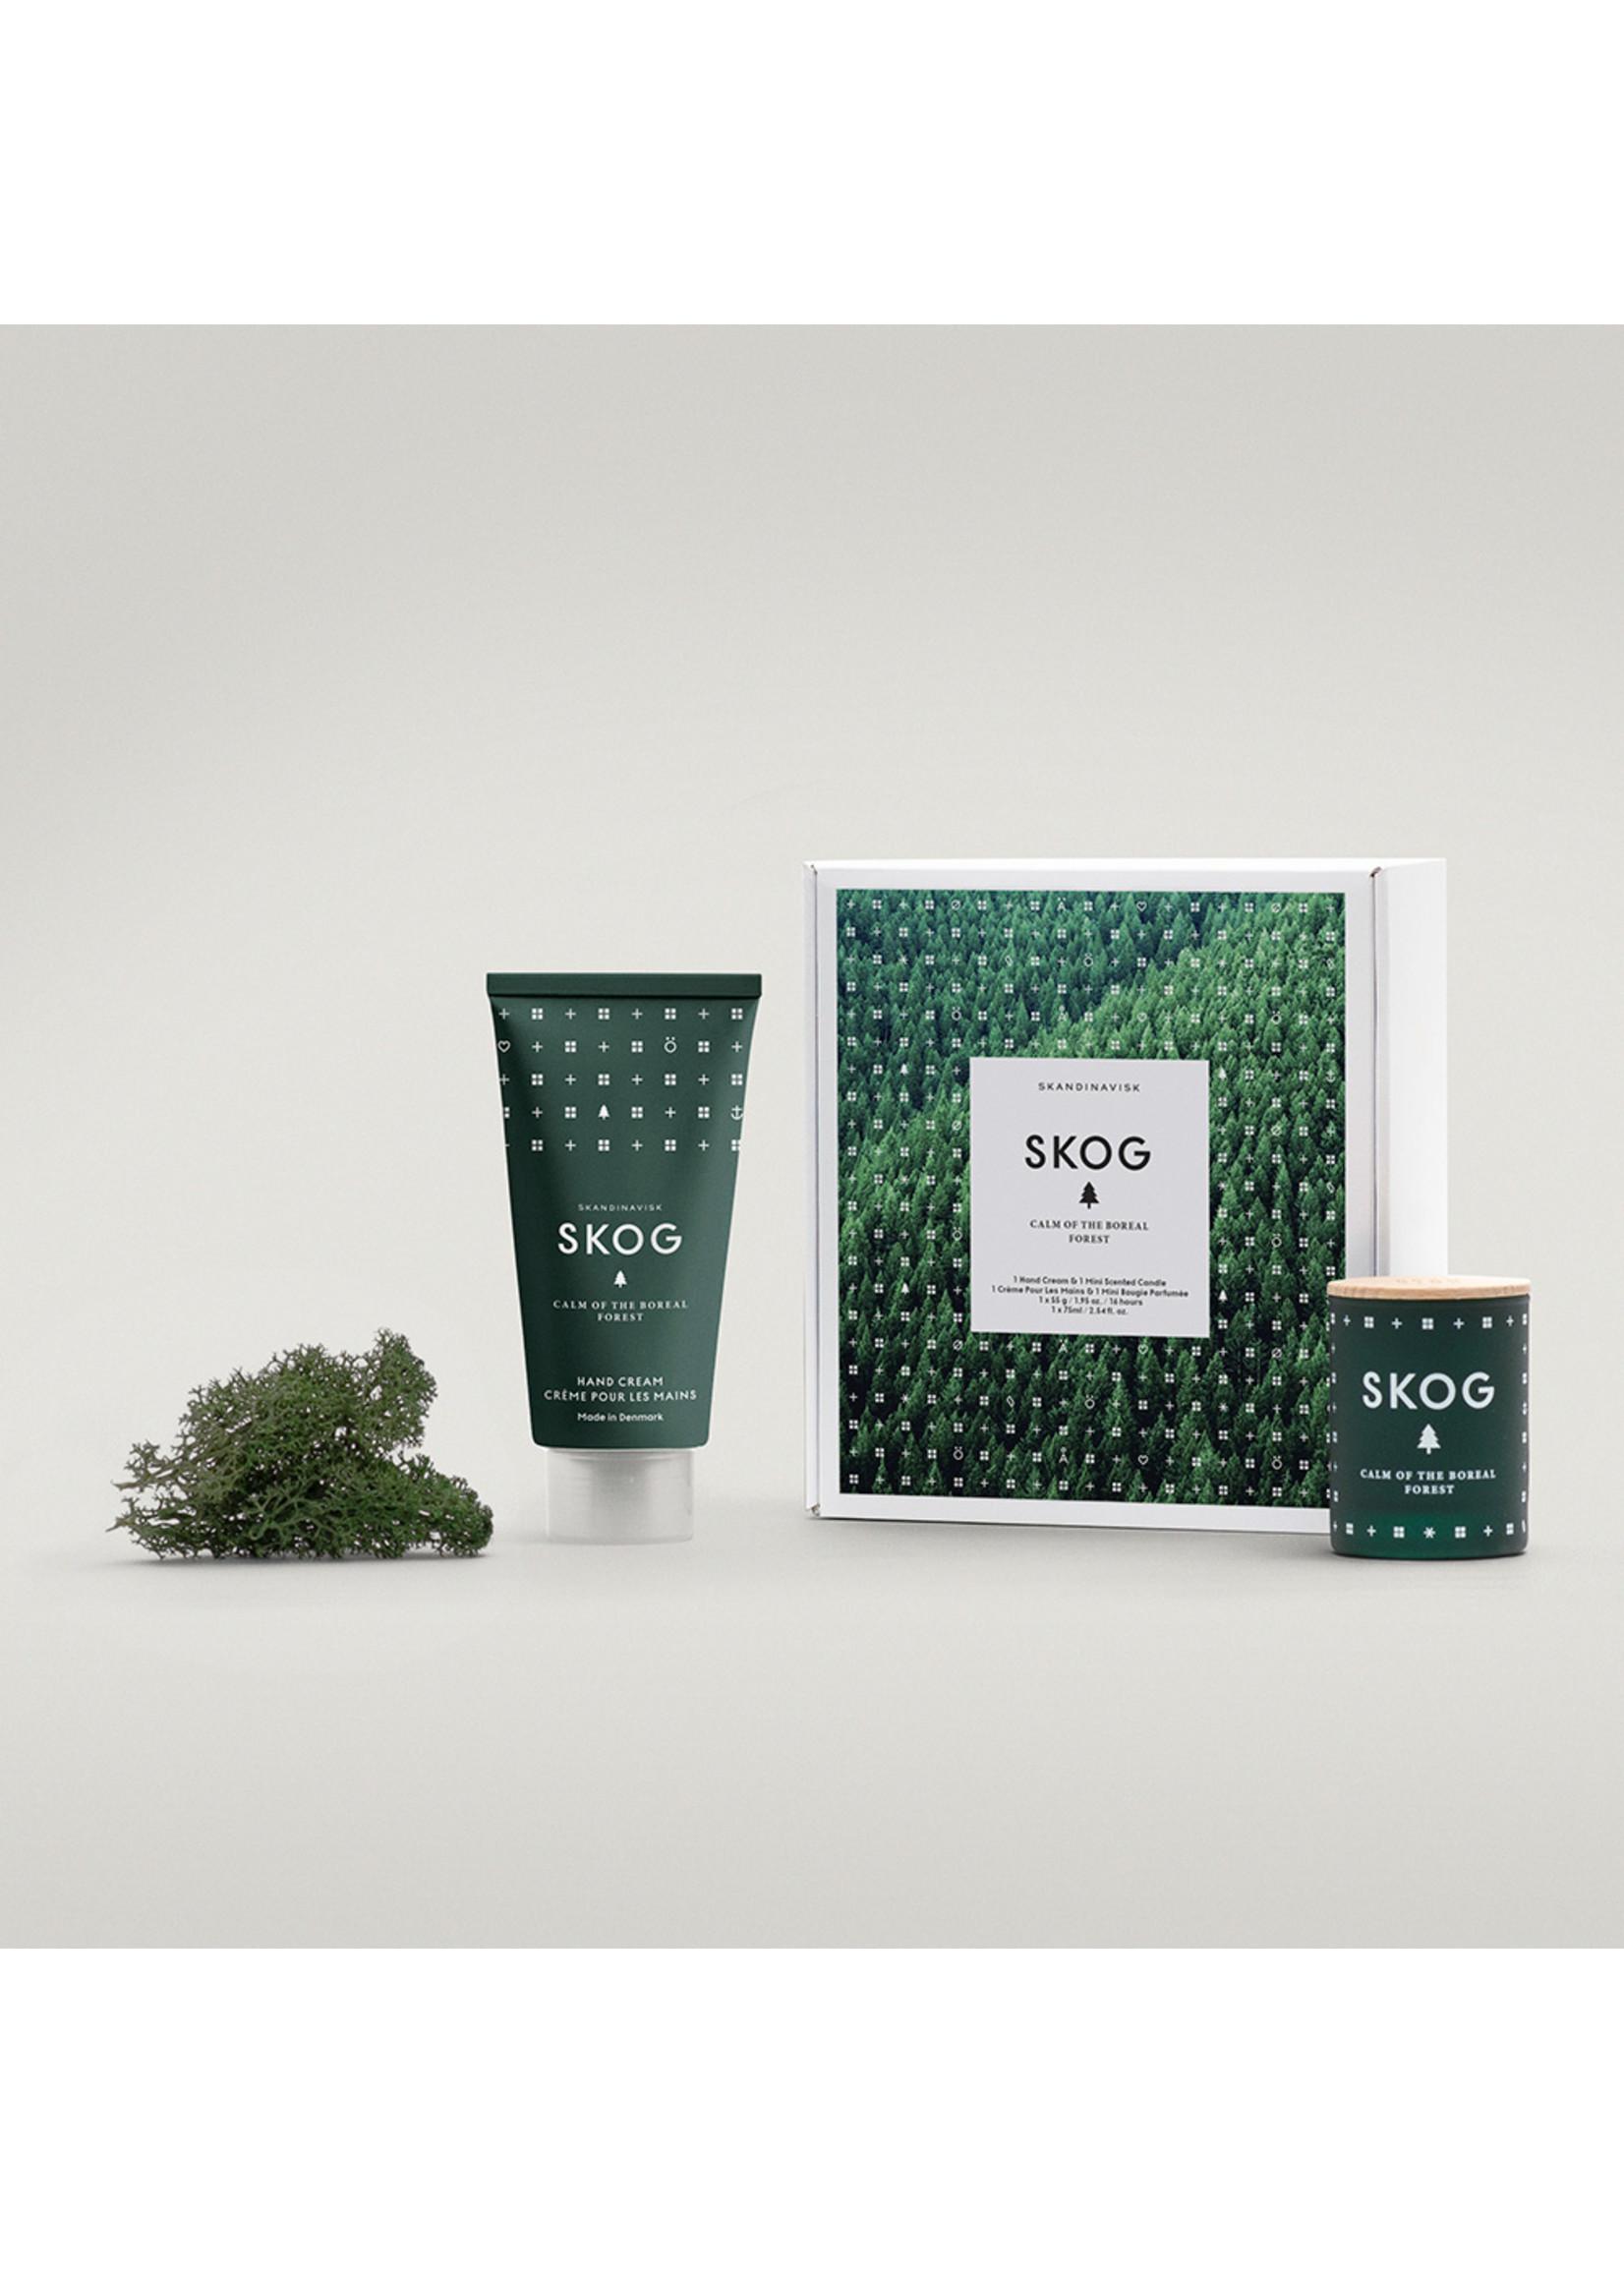 SKANDINAVISK Skandinavisk SKOG -Handcream & Mini Candle GiftSet